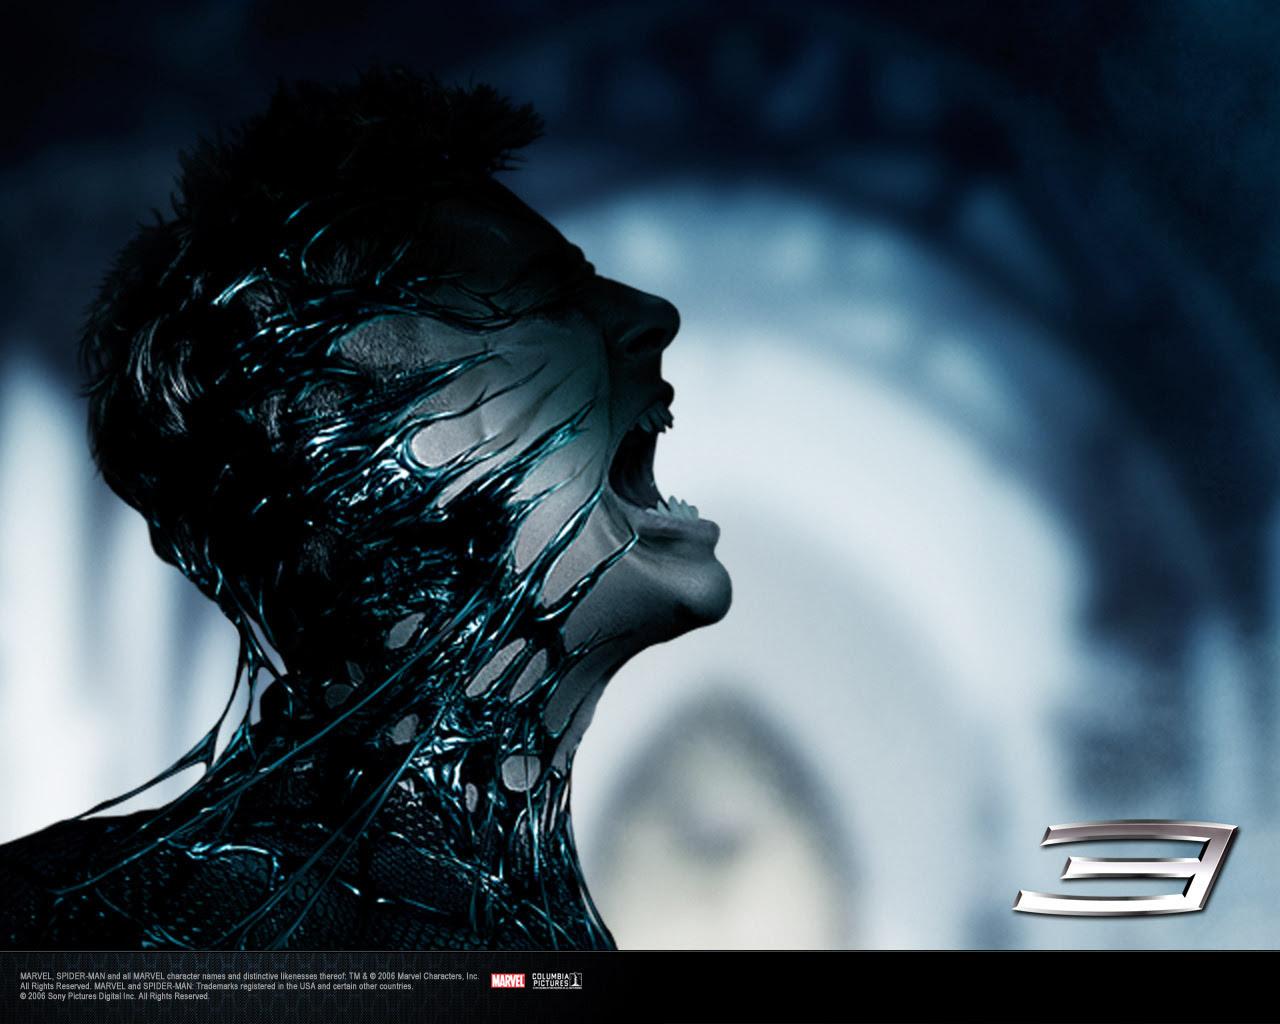 Venom Images Venom Hd Wallpaper And Background Photos 13194576